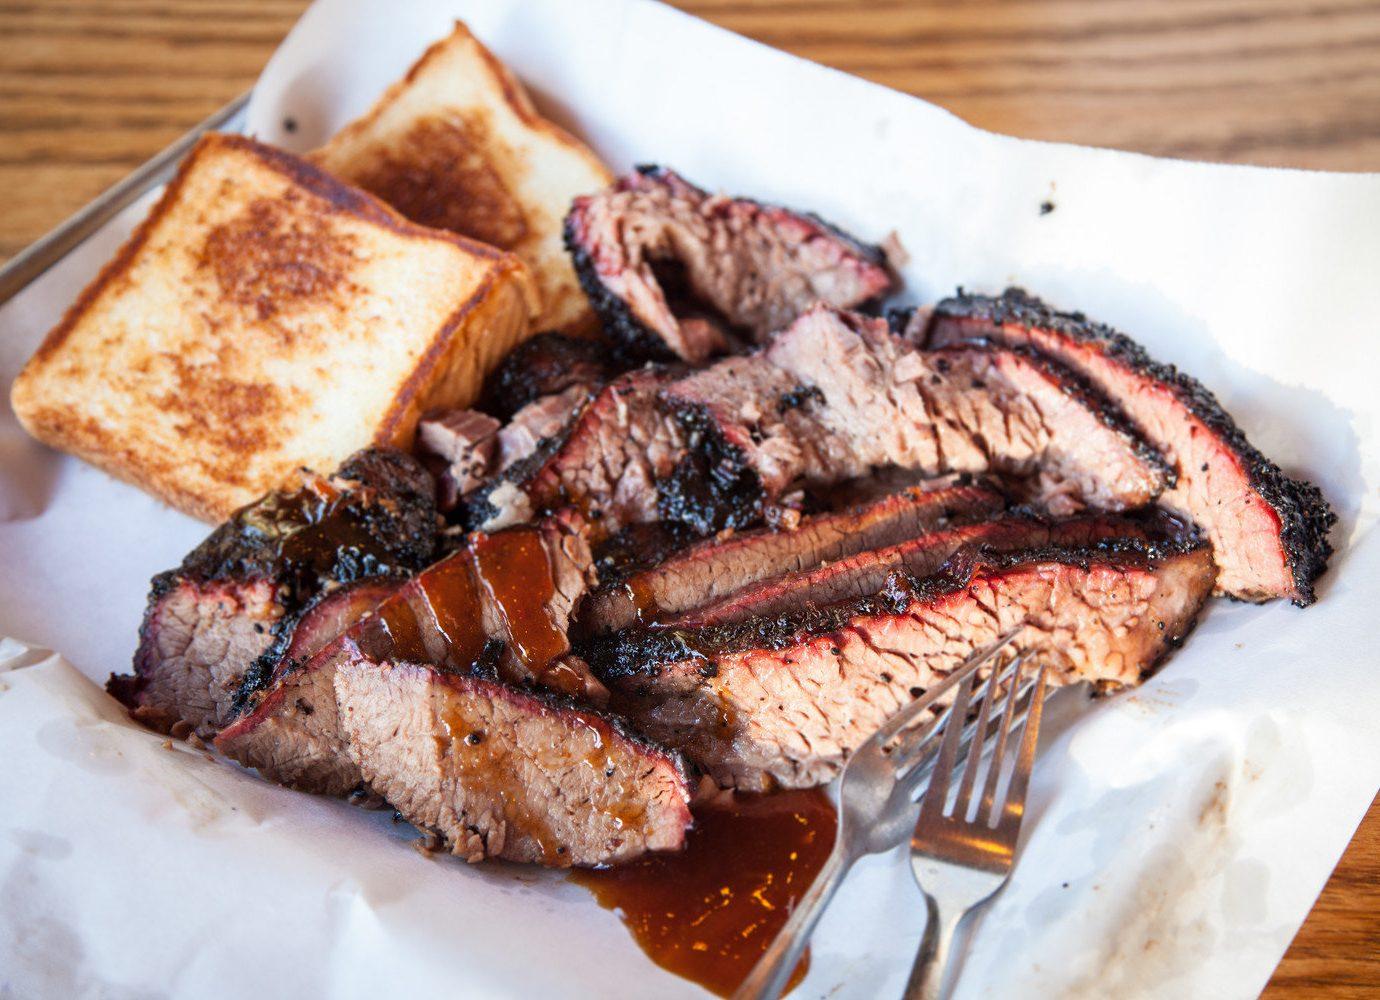 Food + Drink food plate table dish meat piece slice meal roasting steak fork grilling brisket produce breakfast animal source foods cuisine pork dessert sliced barbecue